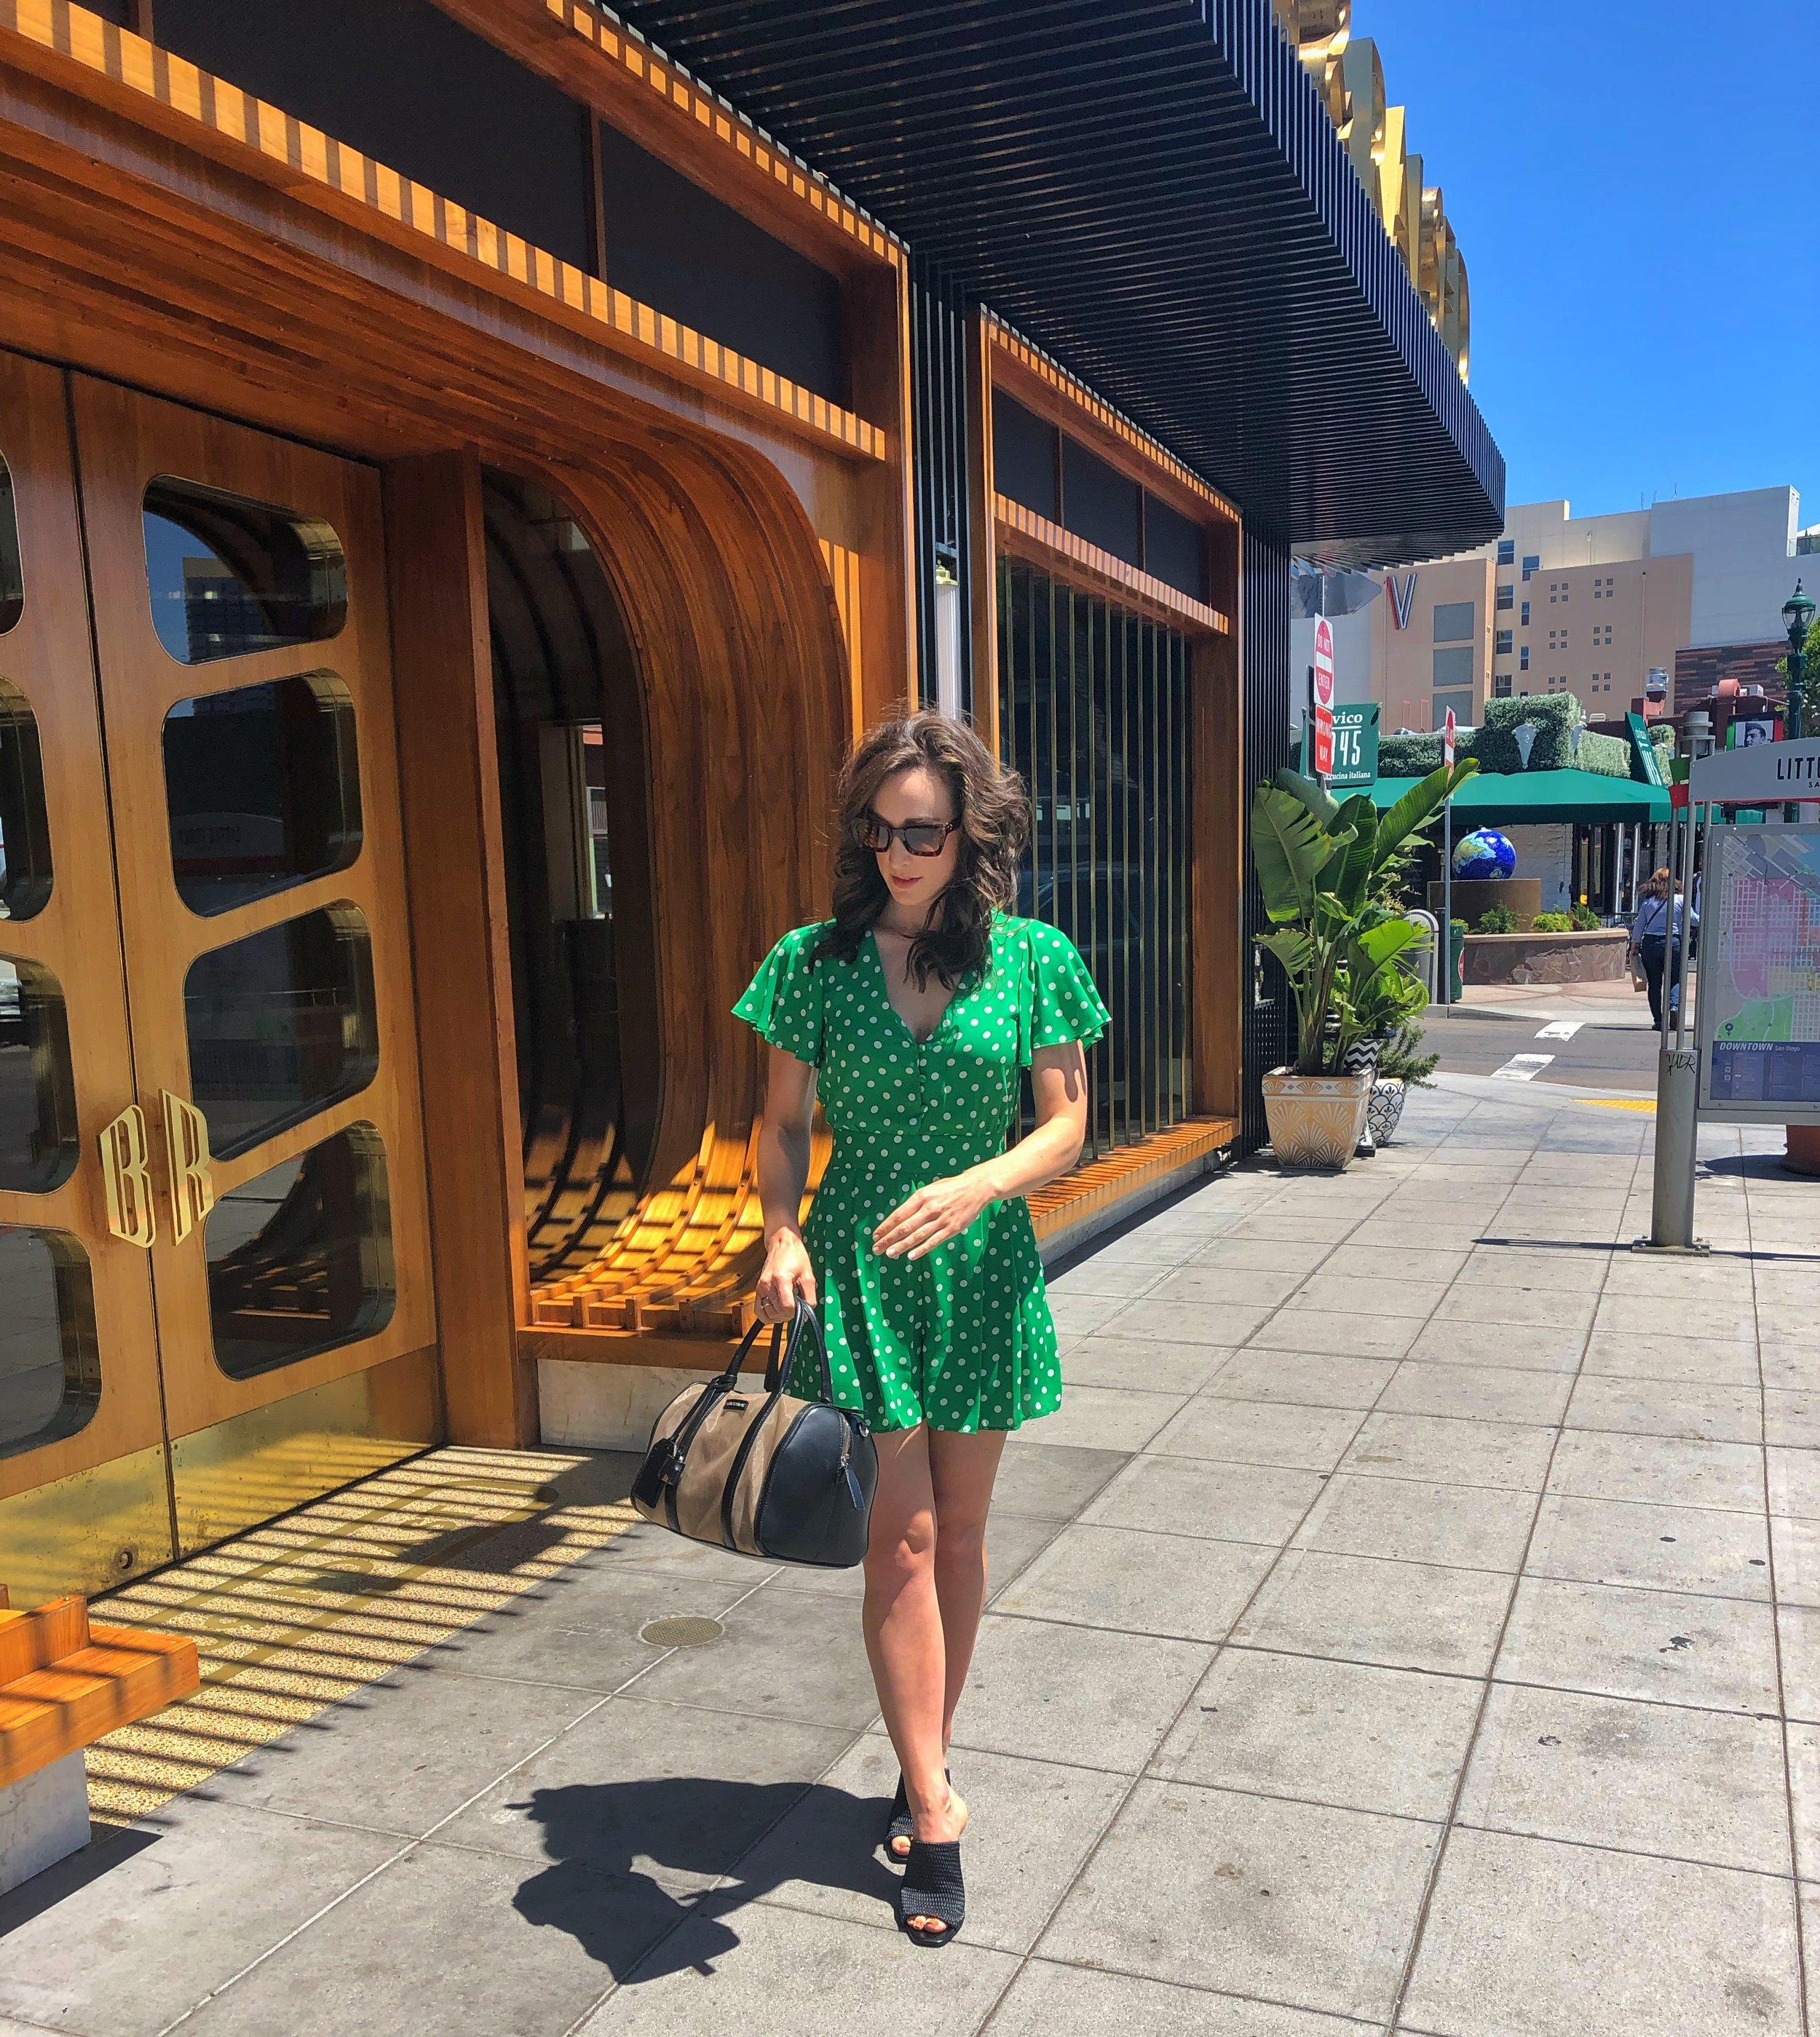 Born & Raised San Diego. BCBGeneration Mules. ZARA green polka dot romper or jumpsuit.